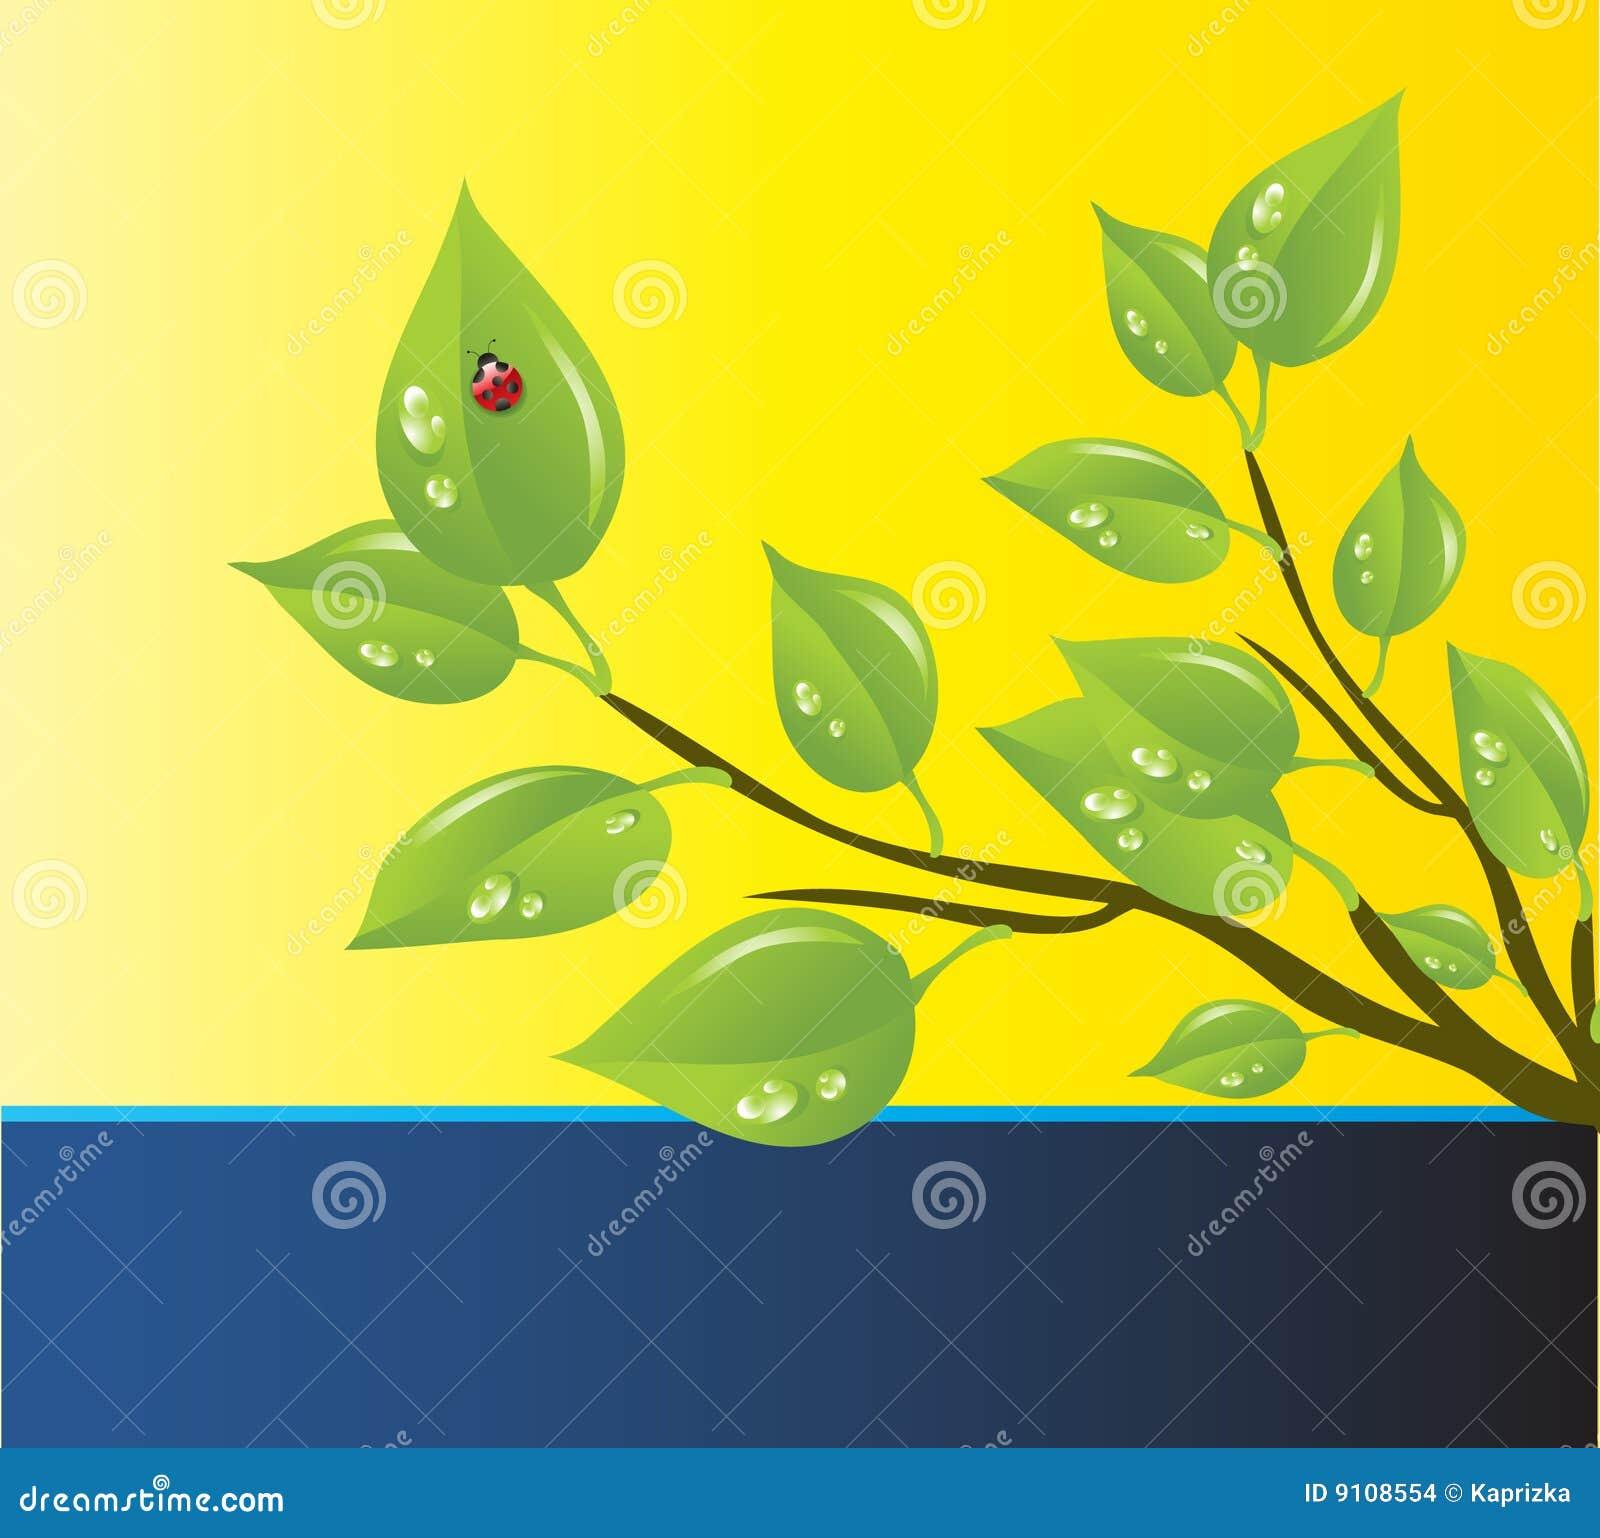 environmental protection plan template - vector template of a environmental protection stock images image 9108554